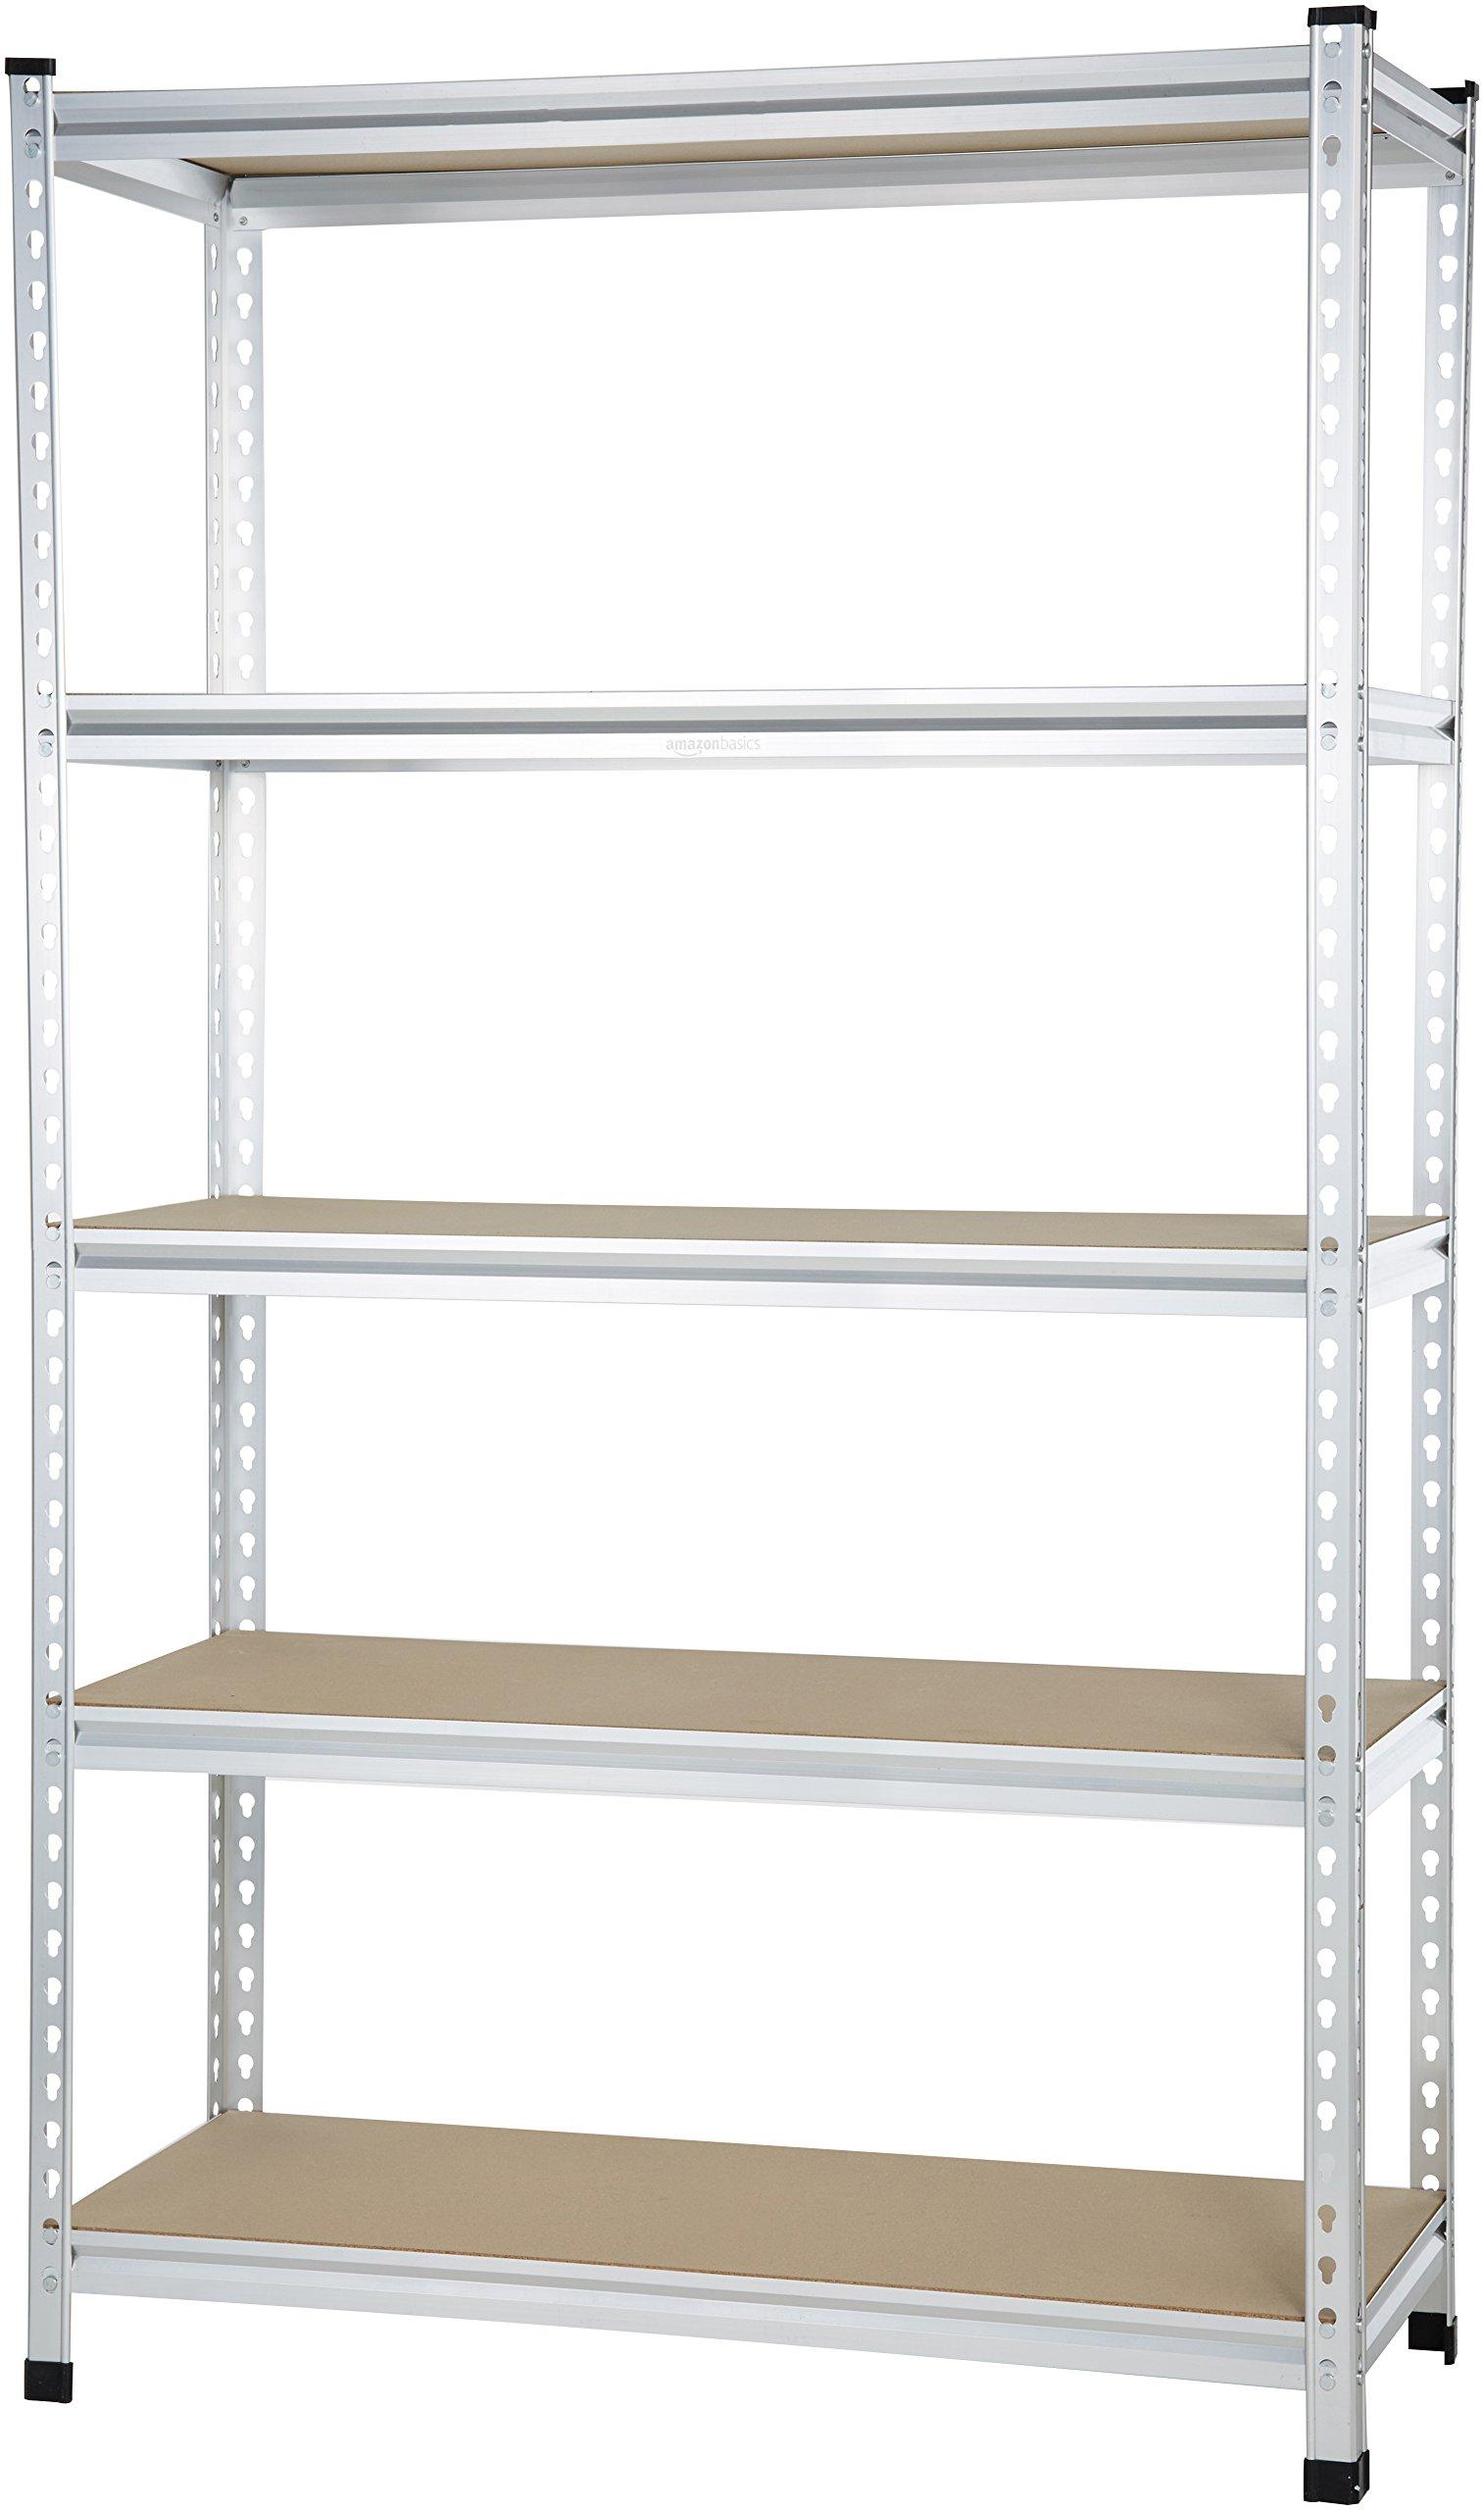 AmazonBasics Medium Duty Shelving Single-Post Press Board Shelf - 48 x 18 x 72